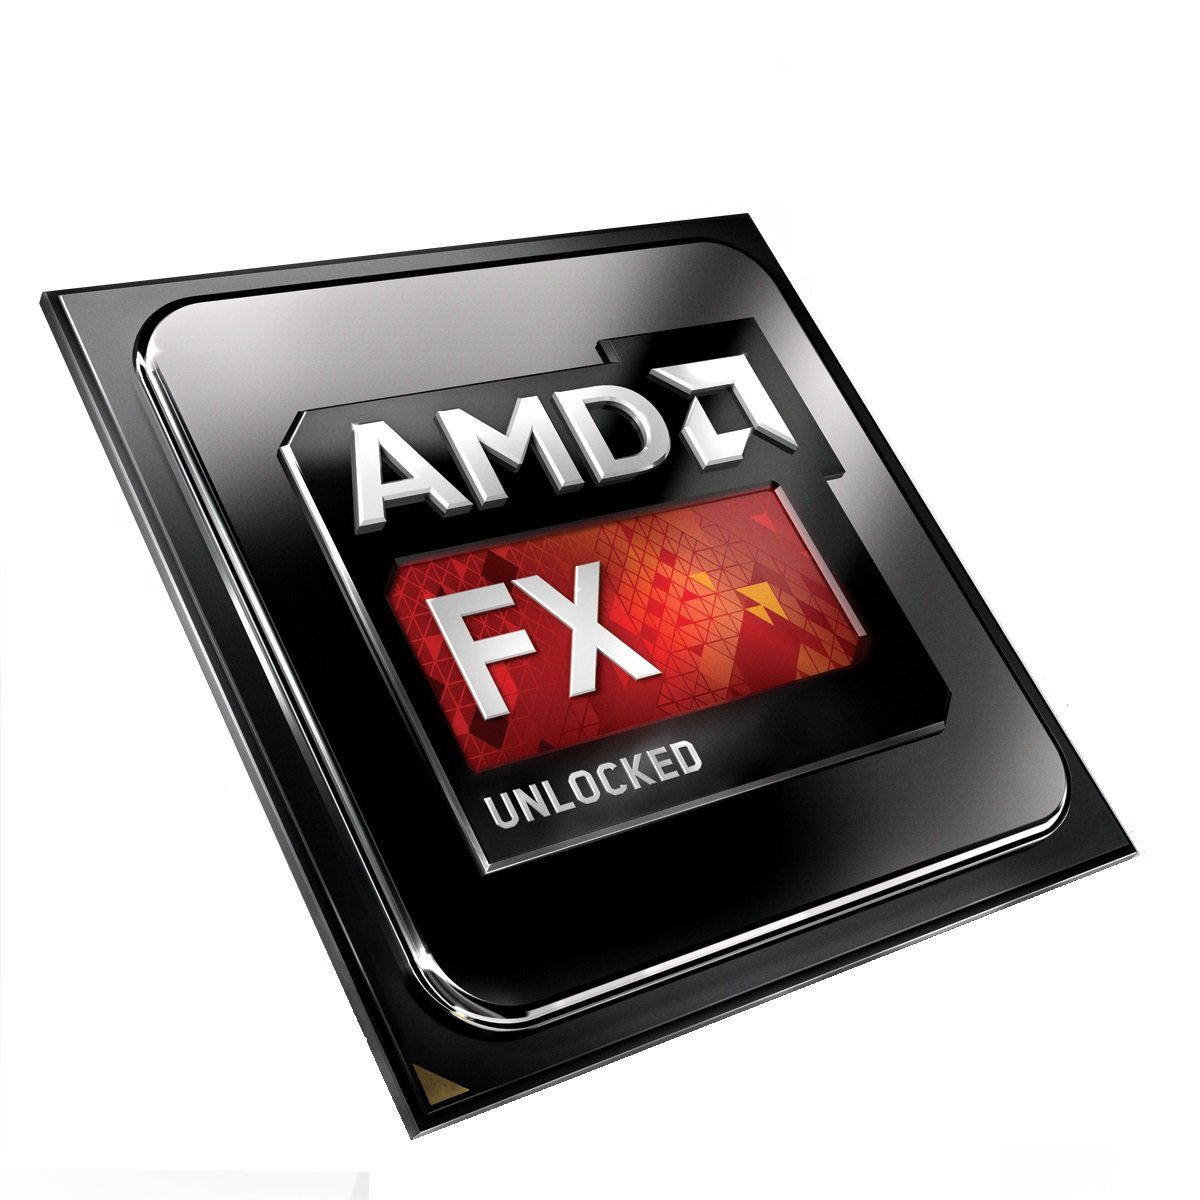 Amd Fd832ewmhkbox Black Edition 8 Core Cpu Computers Prosesor Fx 8370e Ampquotvisheraampquot Accessories